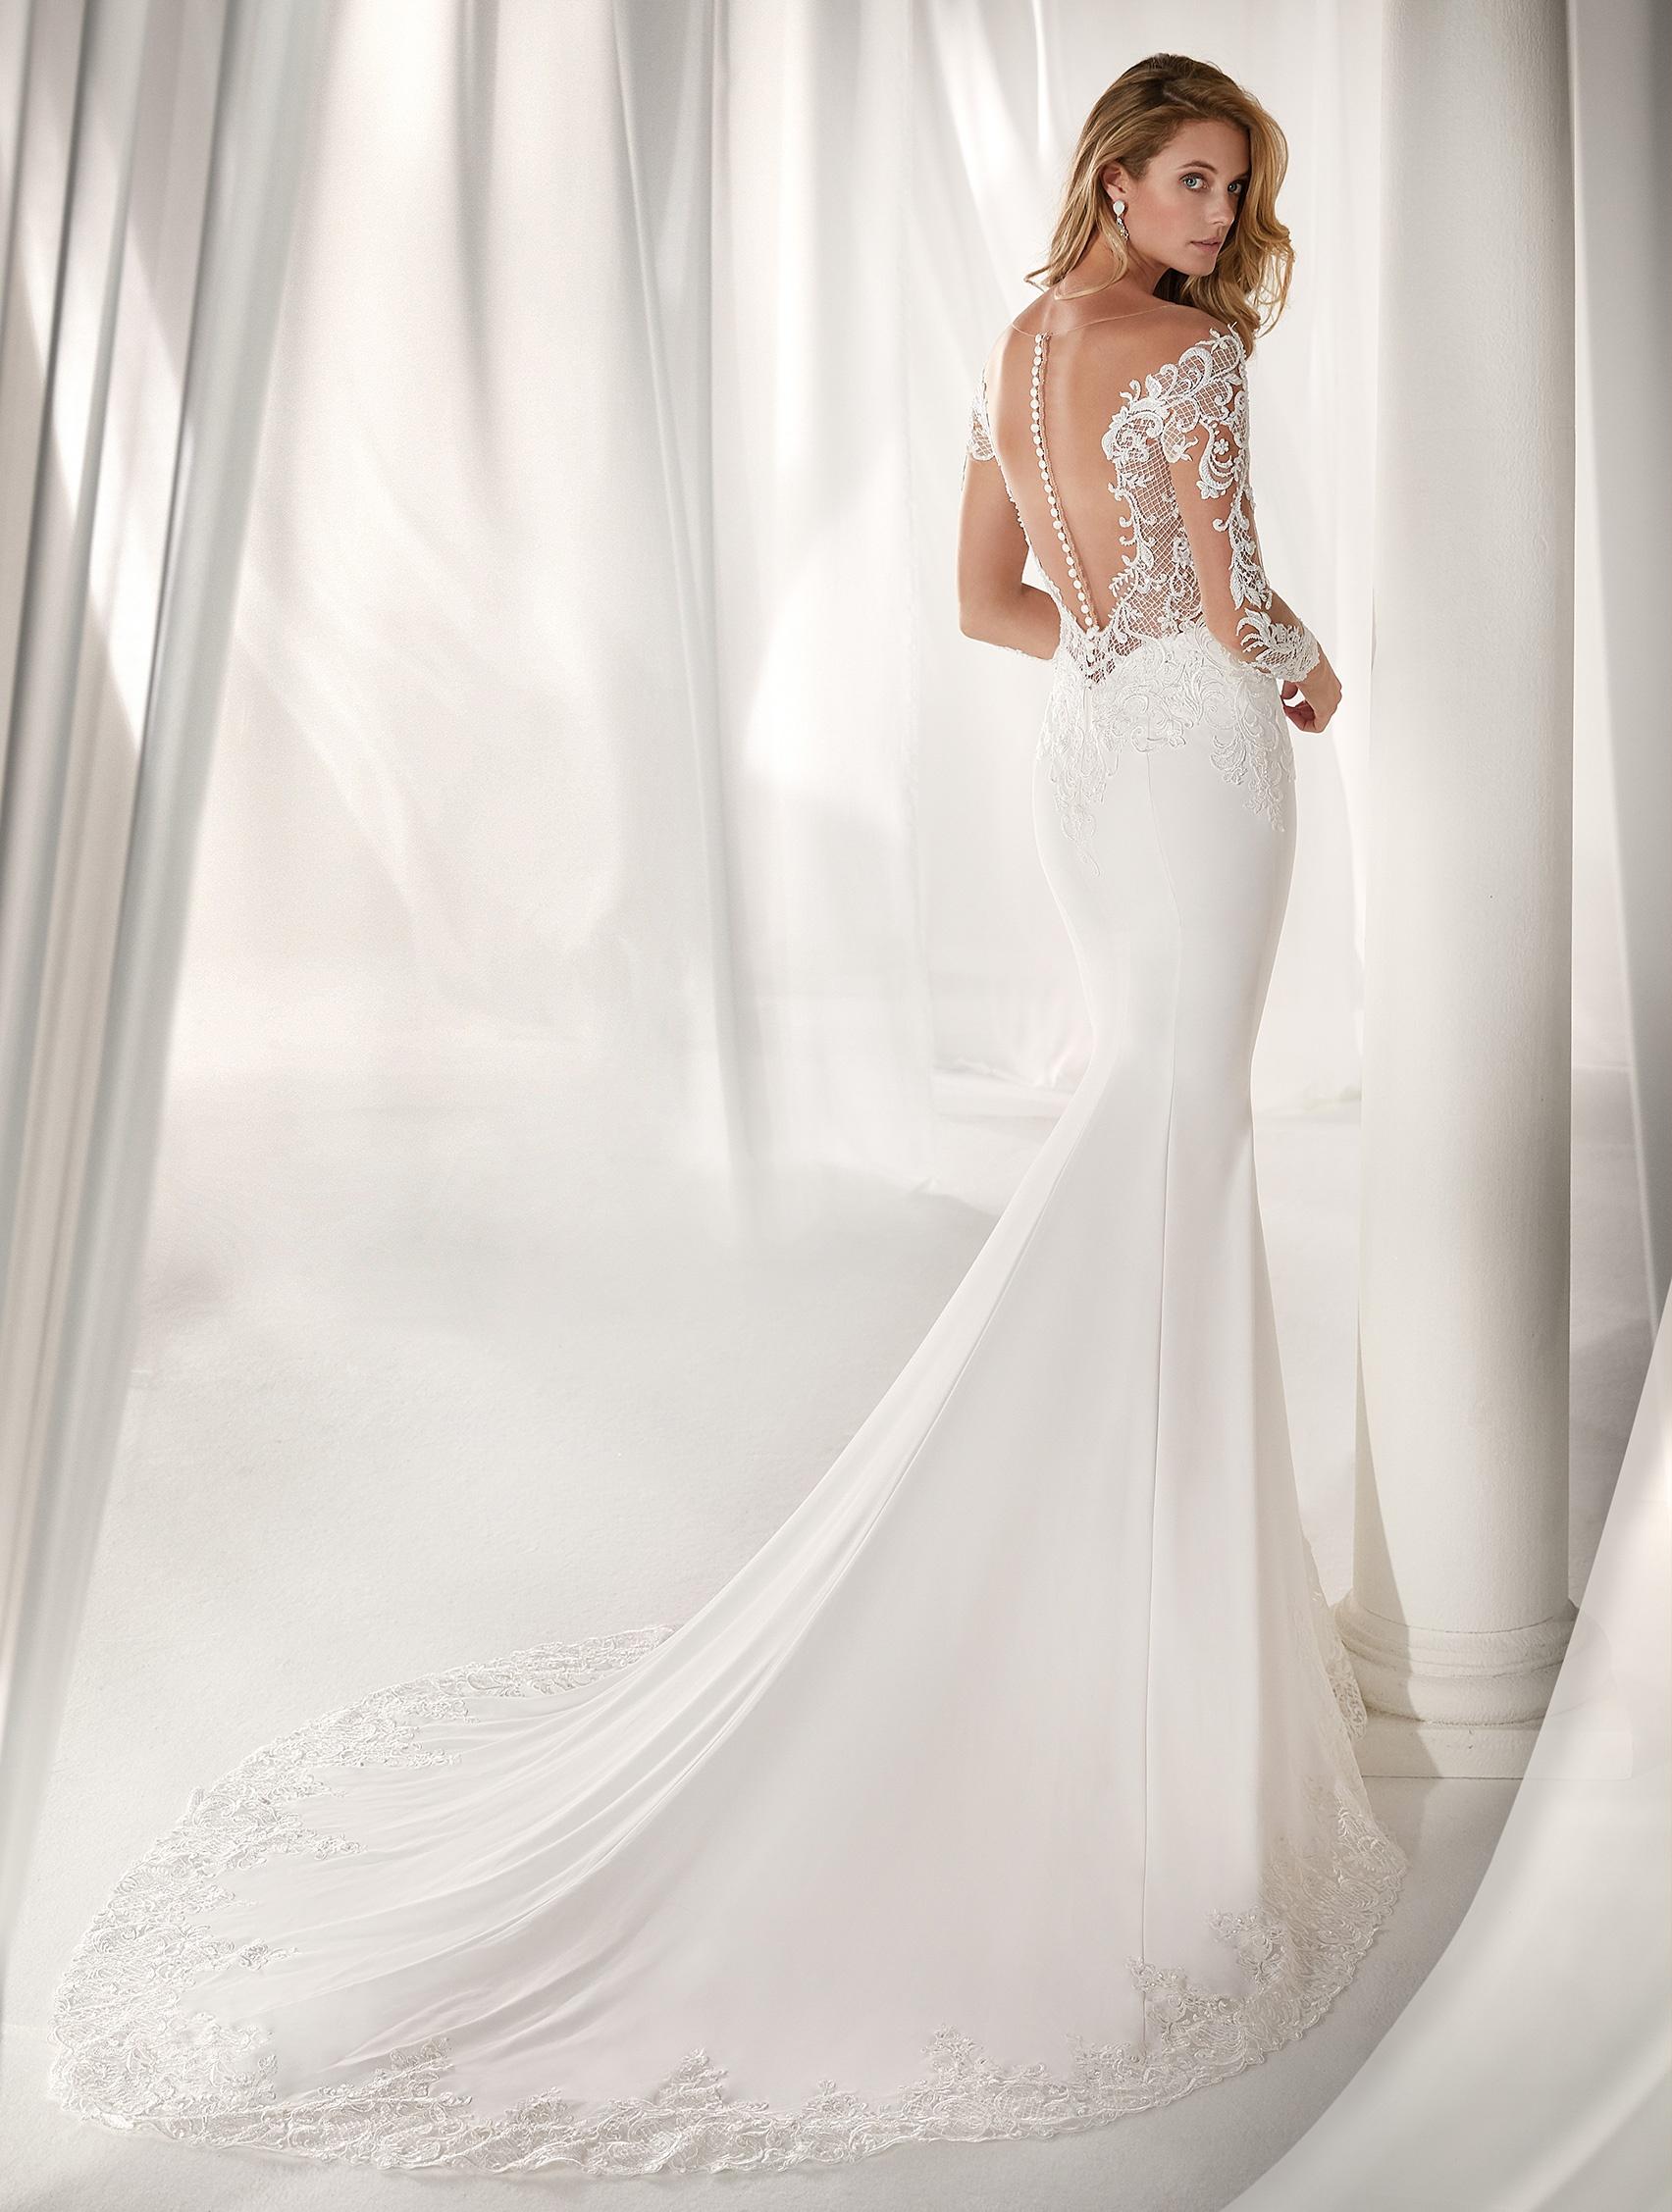 nicole-spose-NIAB19043-Nicole-moda-sposa-2019-508.jpg